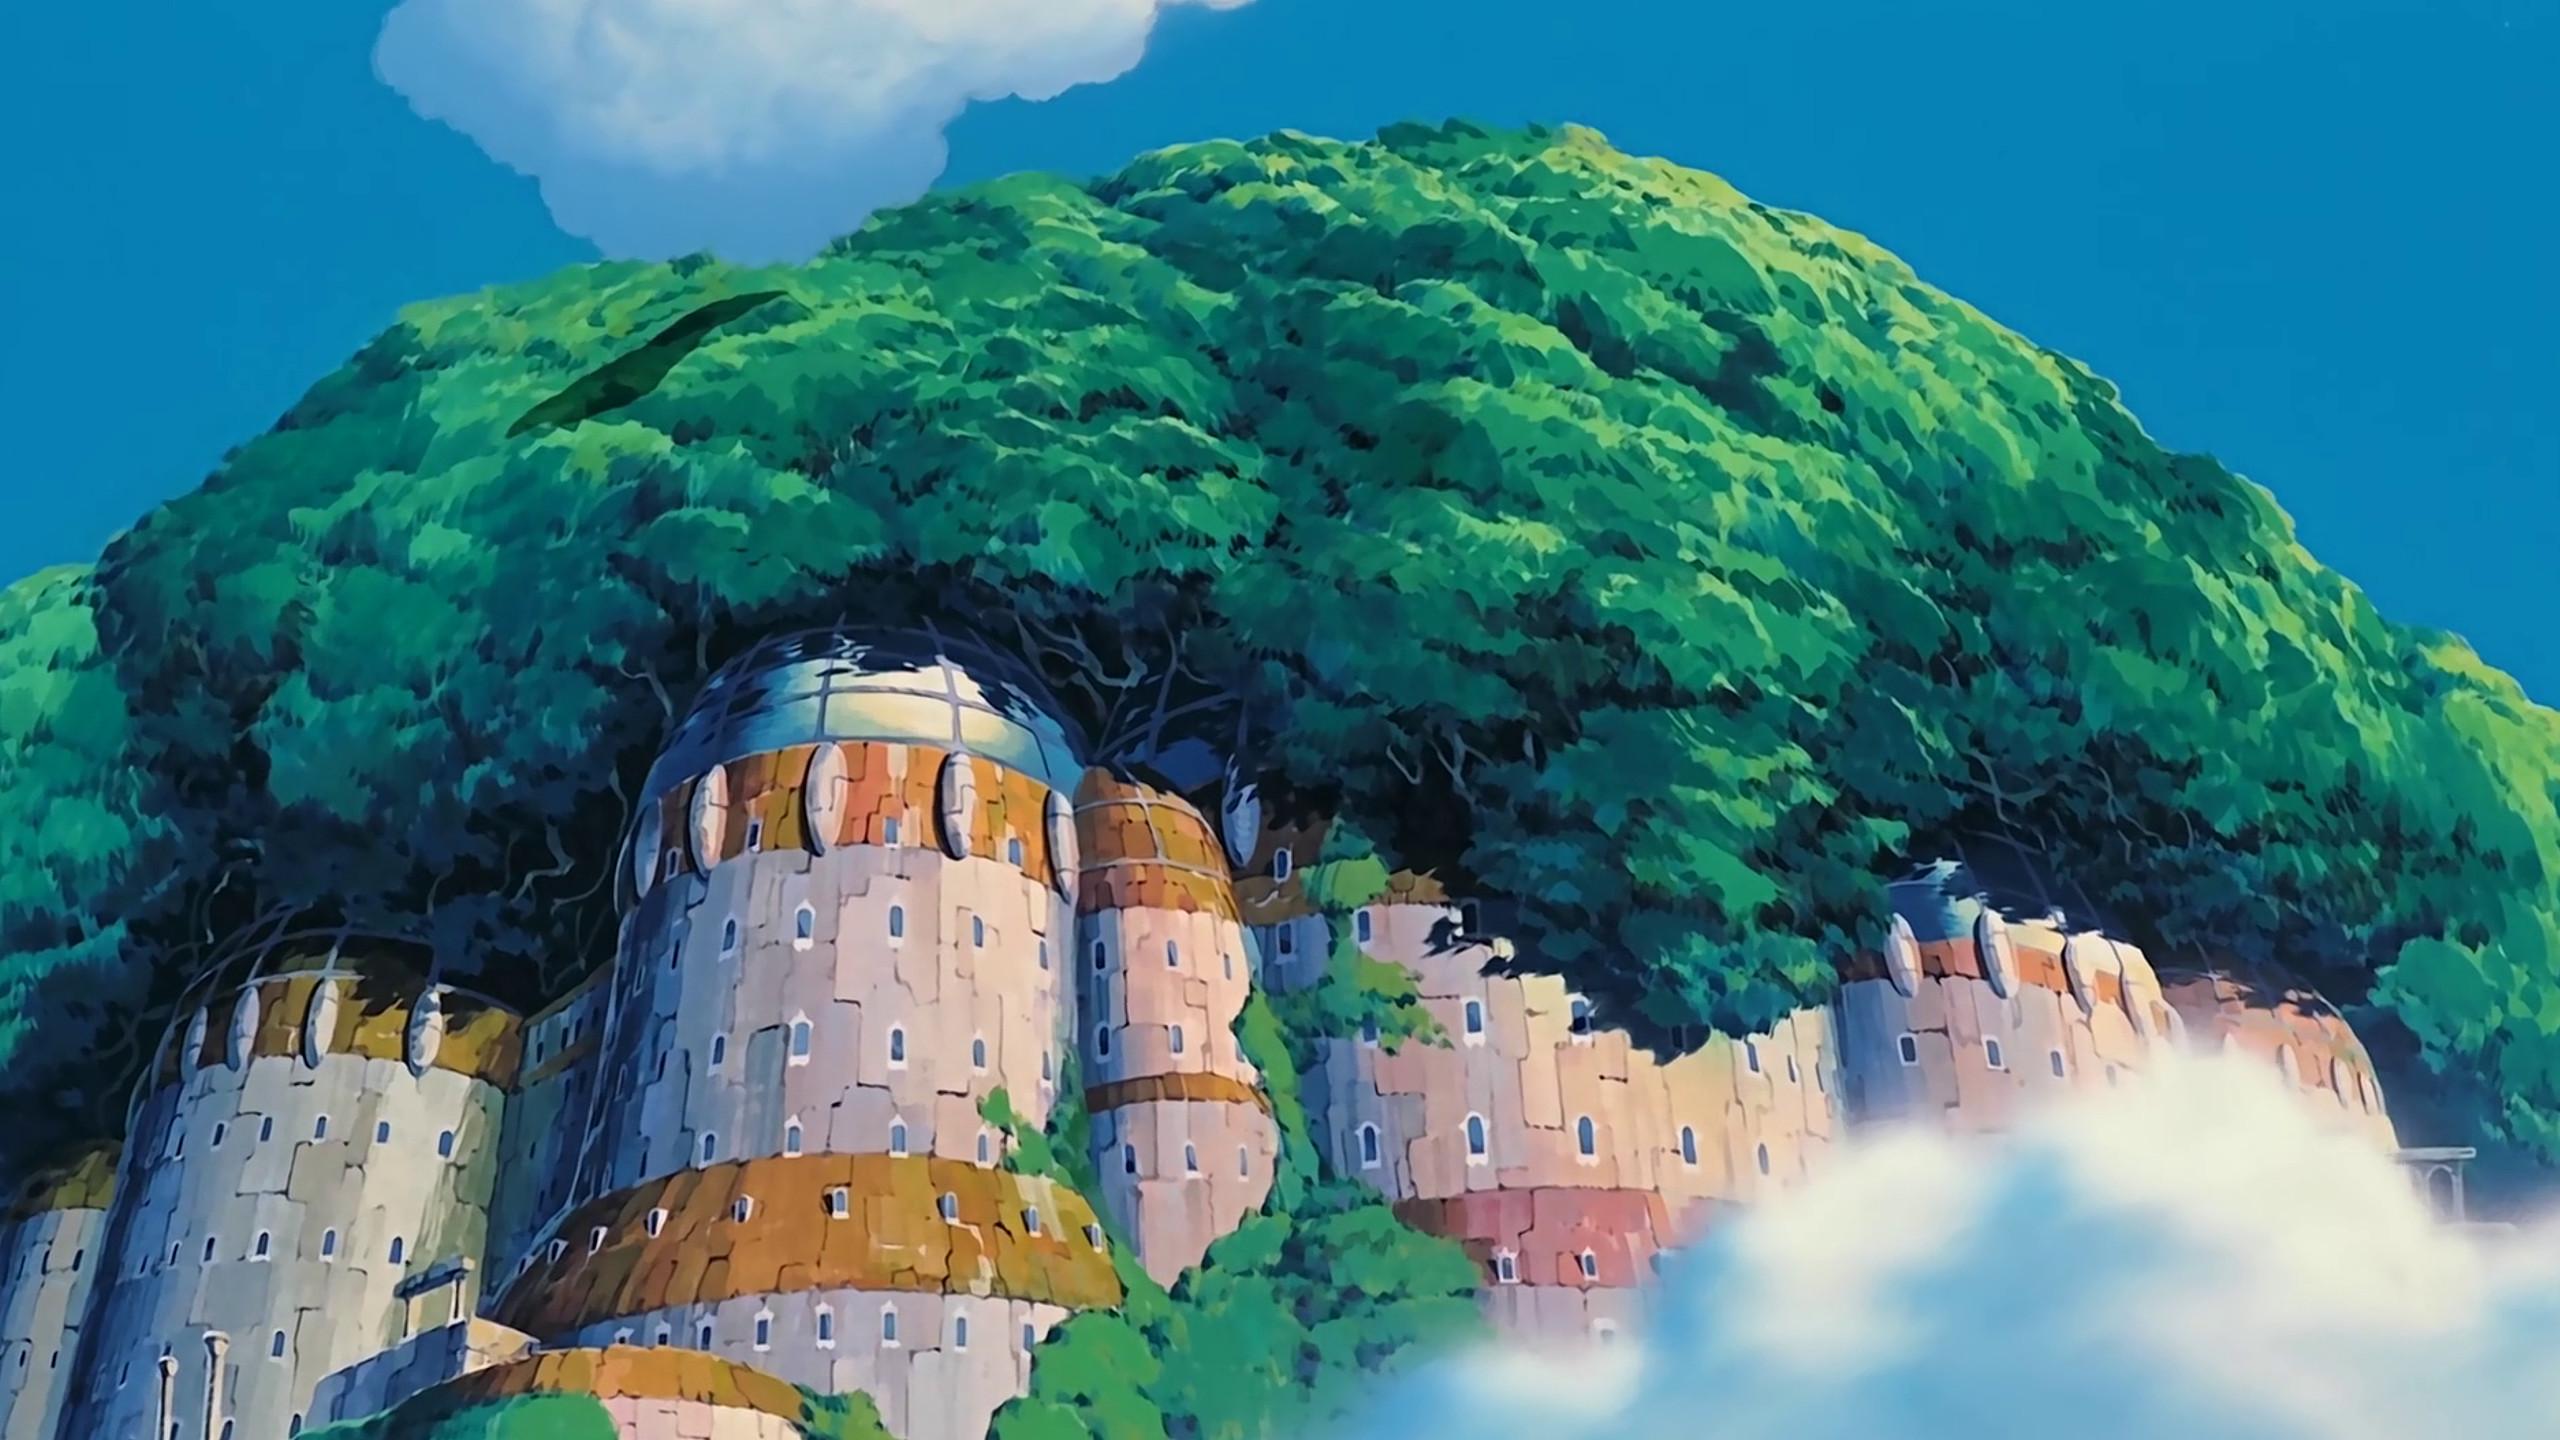 Studio Ghibli Wallpaper 74 Pictures